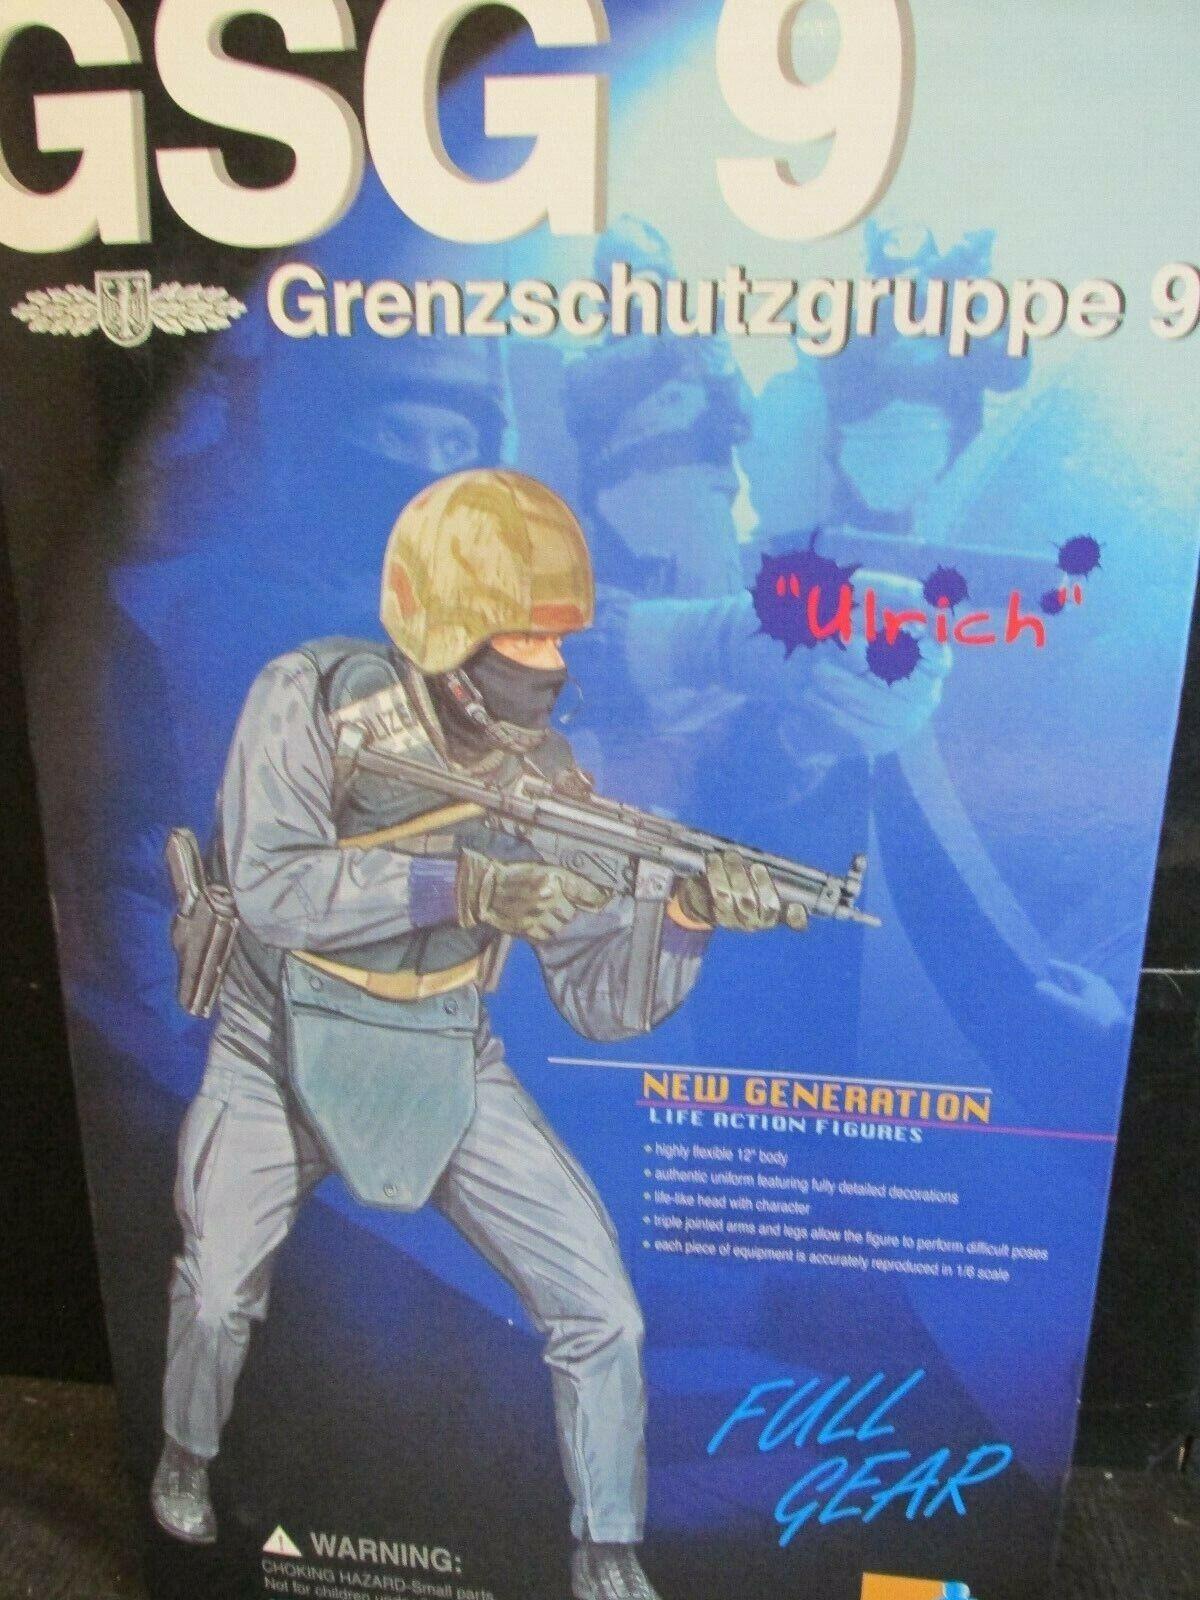 Dragon Side show 1 6TH scale figures GSG 9 Grenzschutzgruppe 9  ULRICH